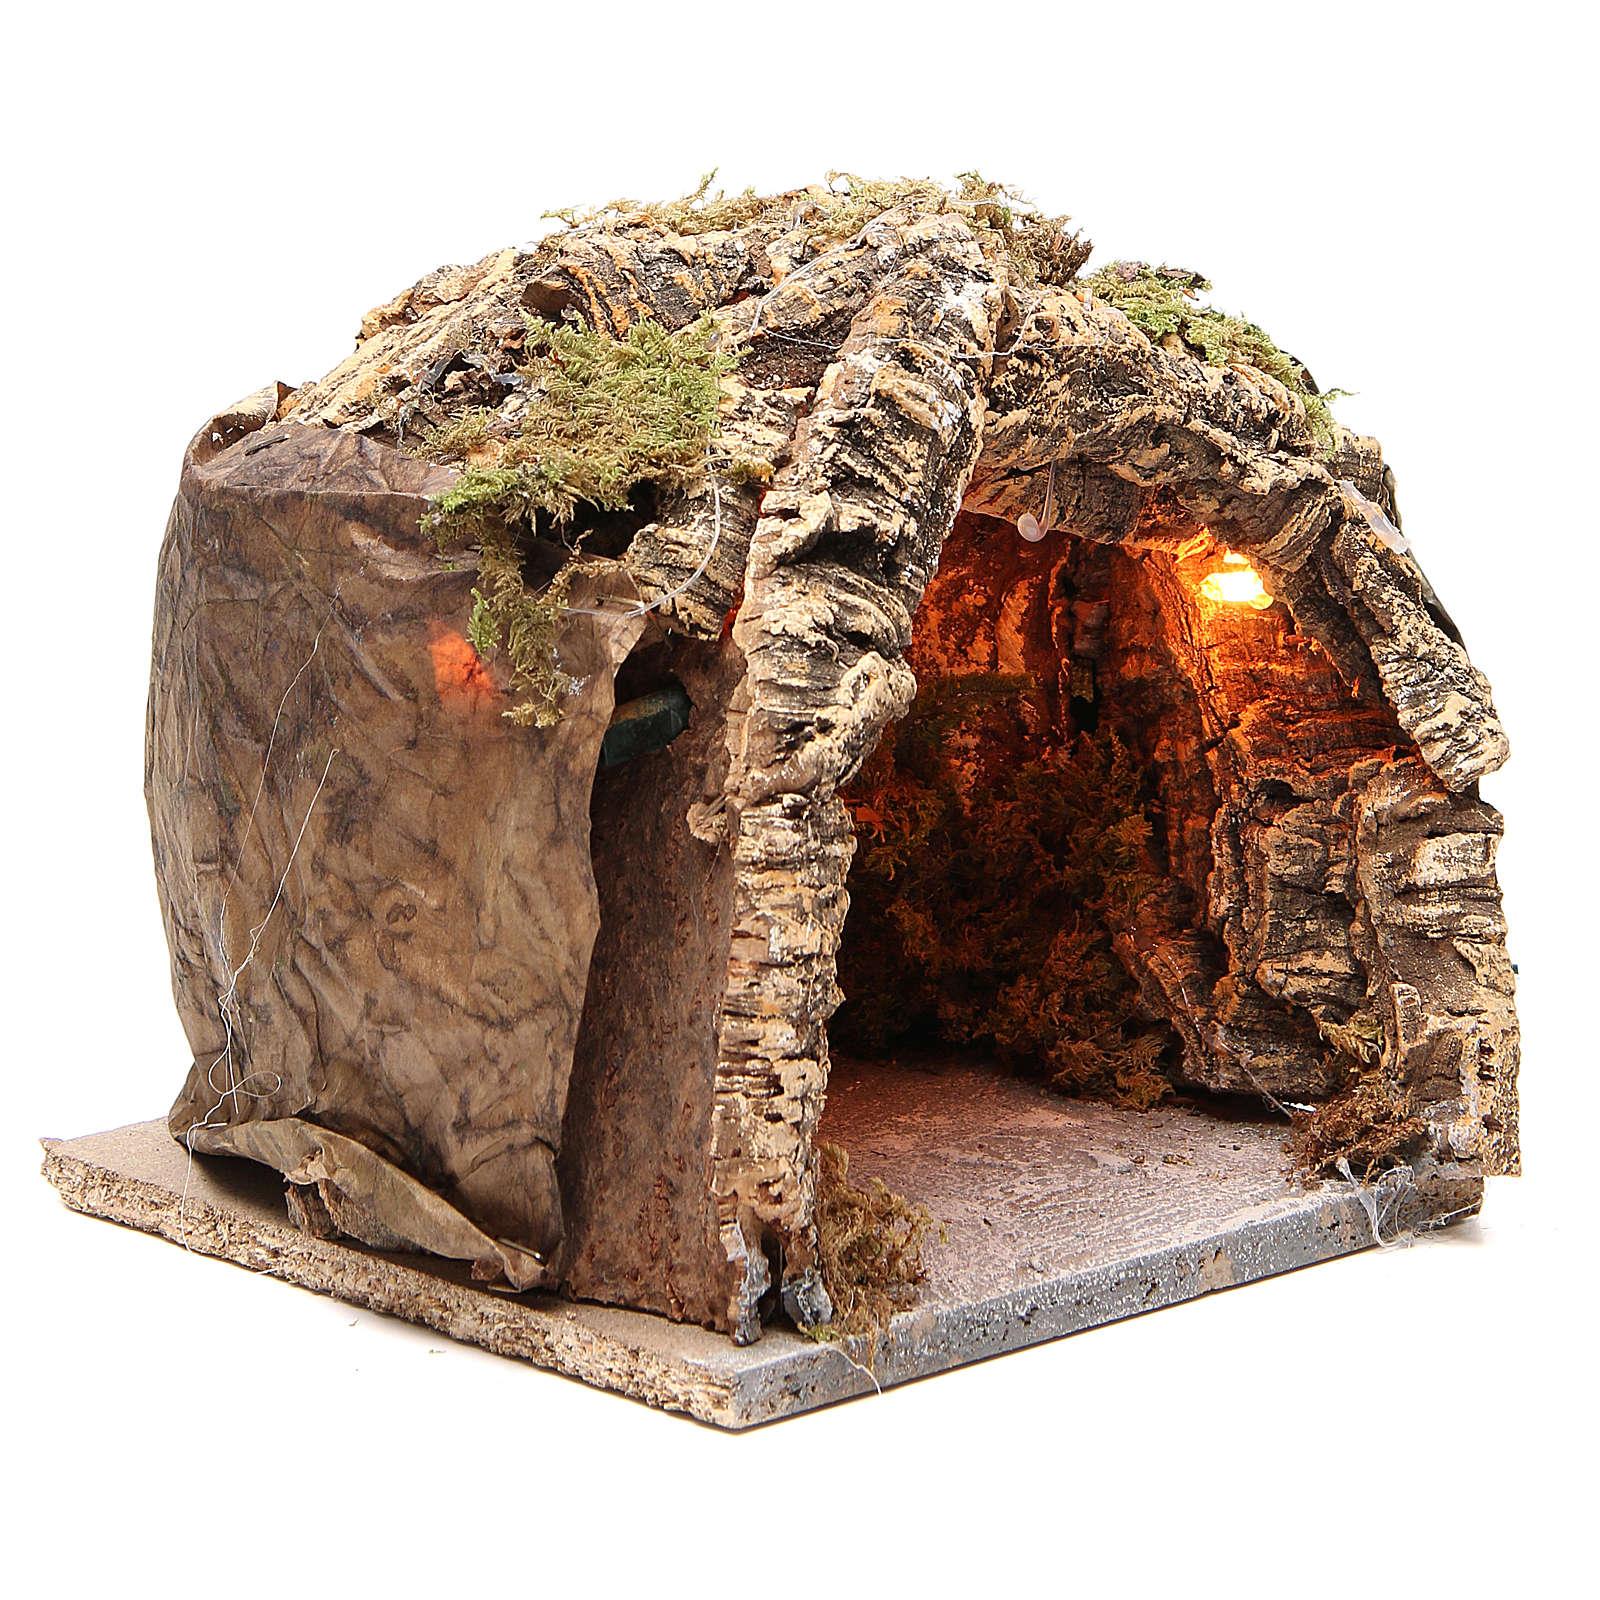 Grotta illuminata presepe napoletano 20x20x18 cm sughero 4